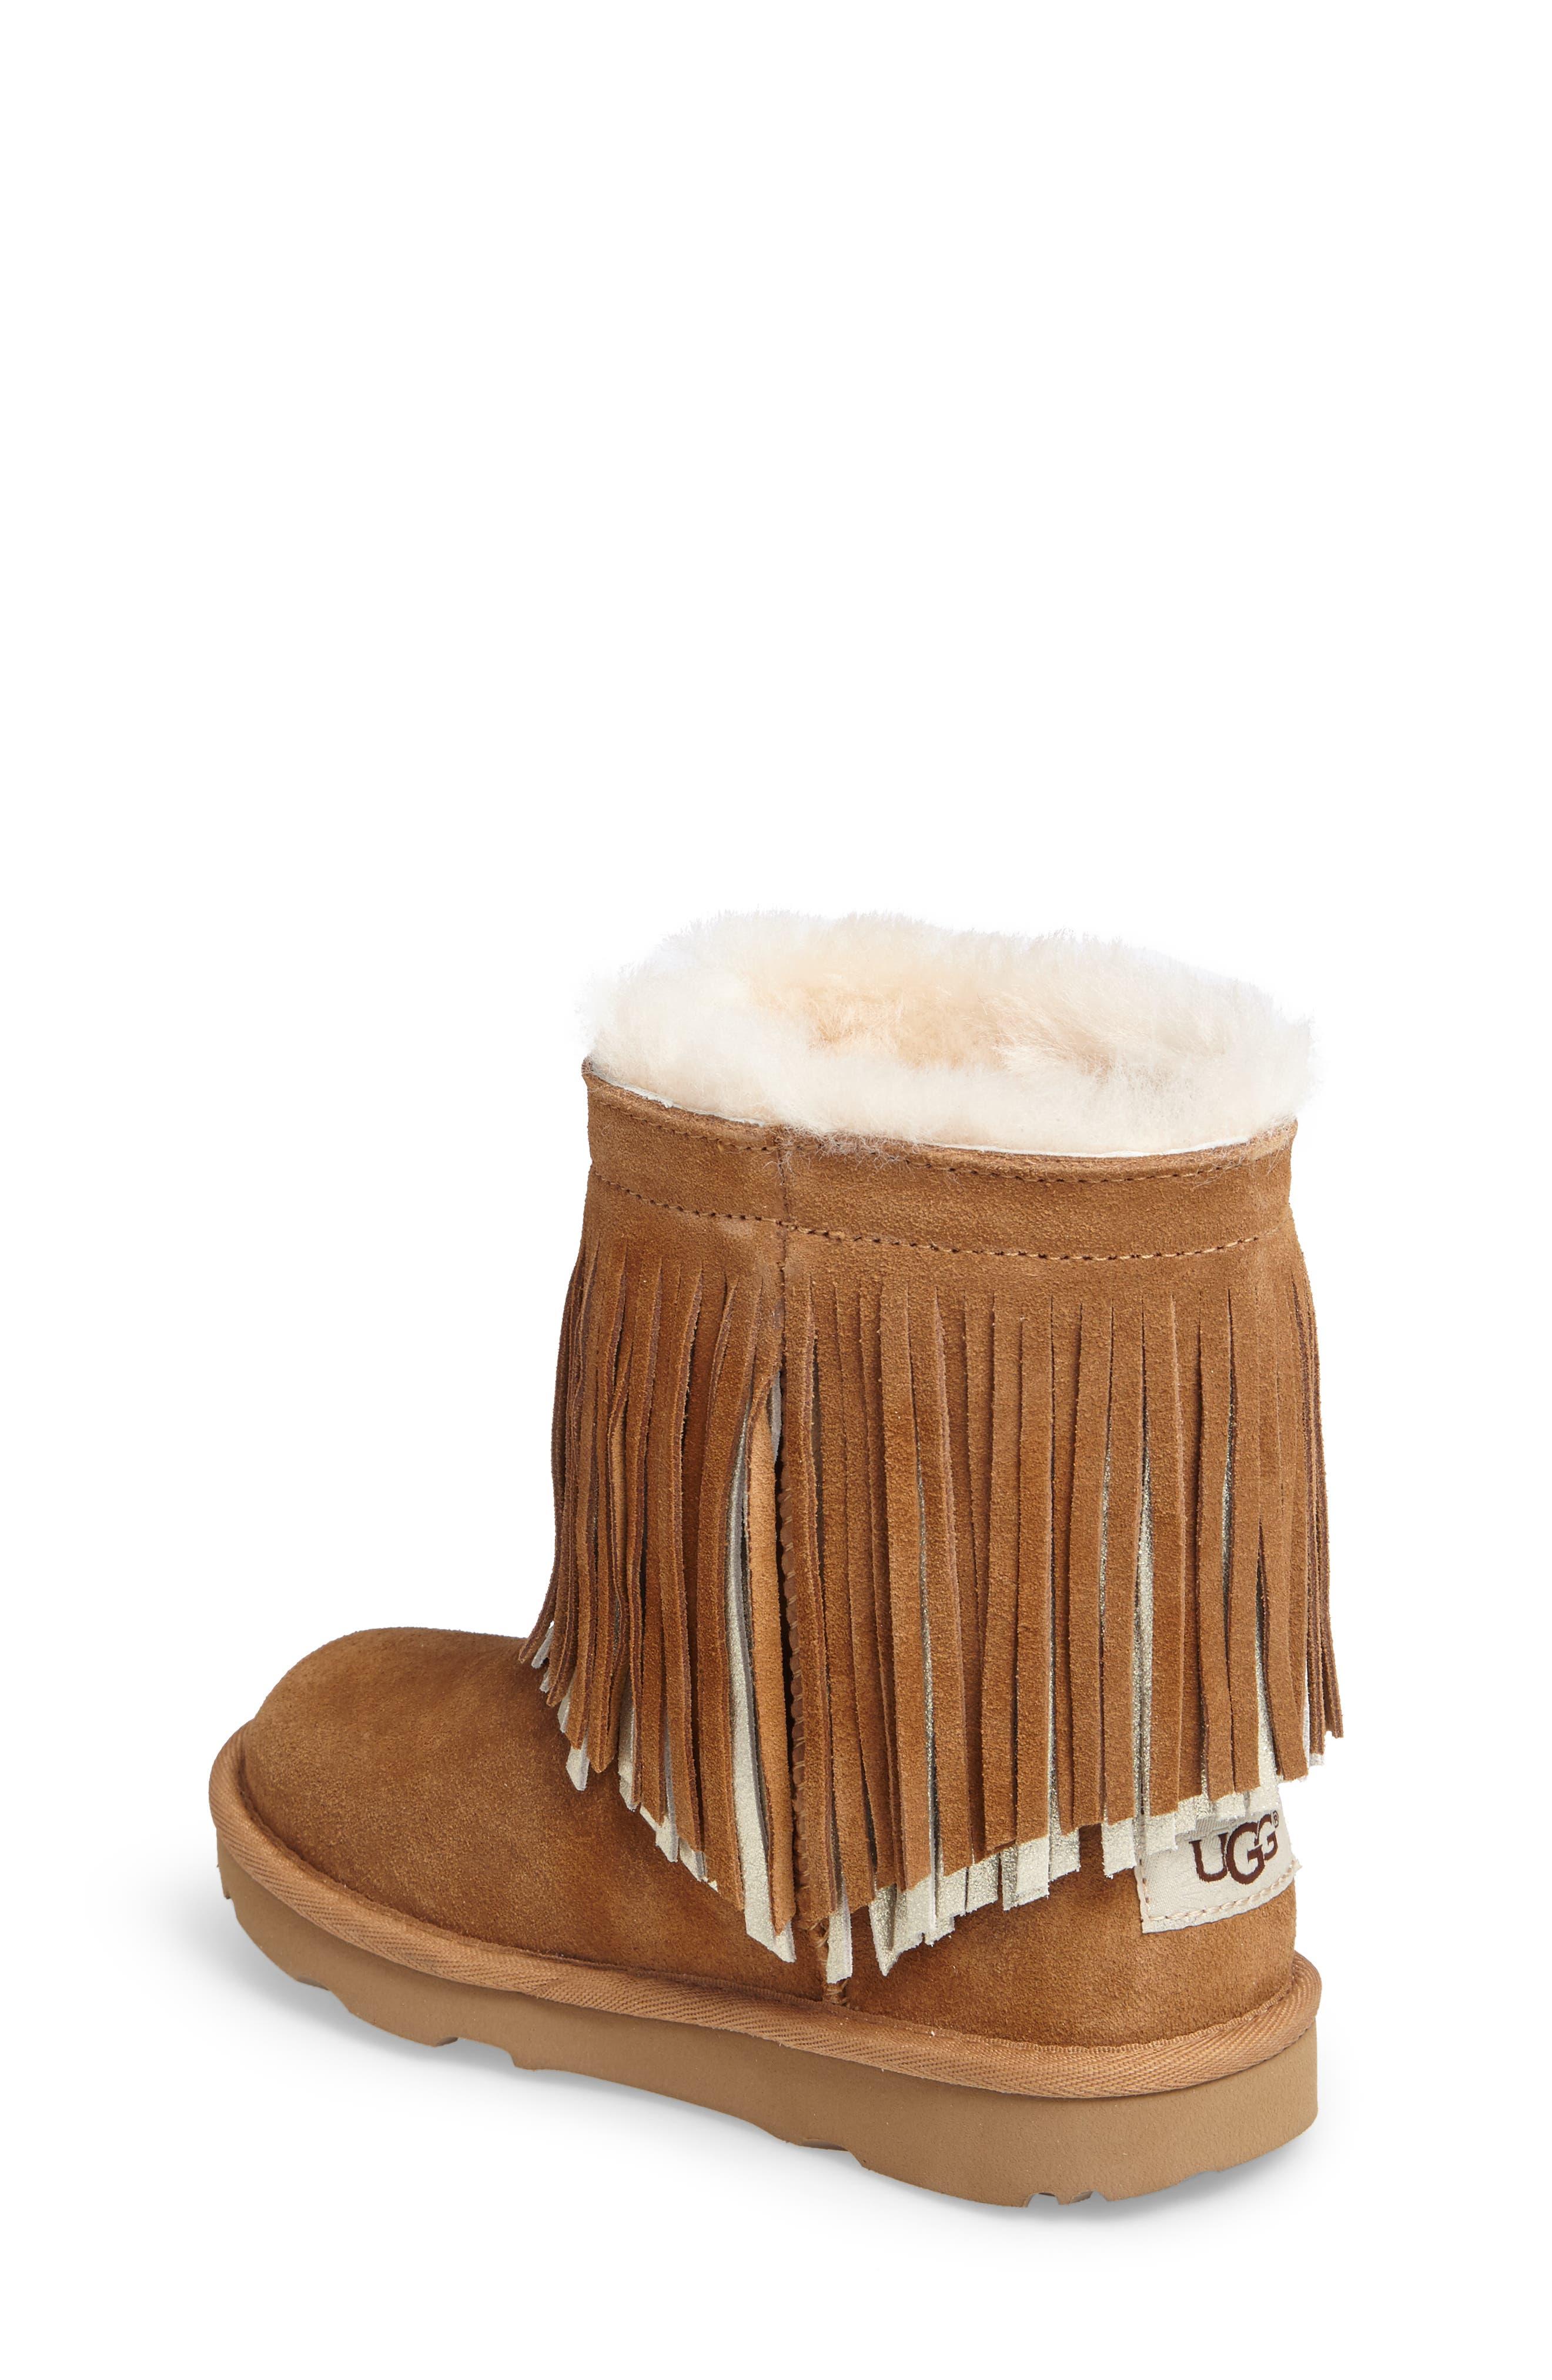 Alternate Image 2  - UGG® Classic II Short Fringe Water Resistant Genuine Shearling Boot (Walker, Toddler, Little Kid & Big Kid)